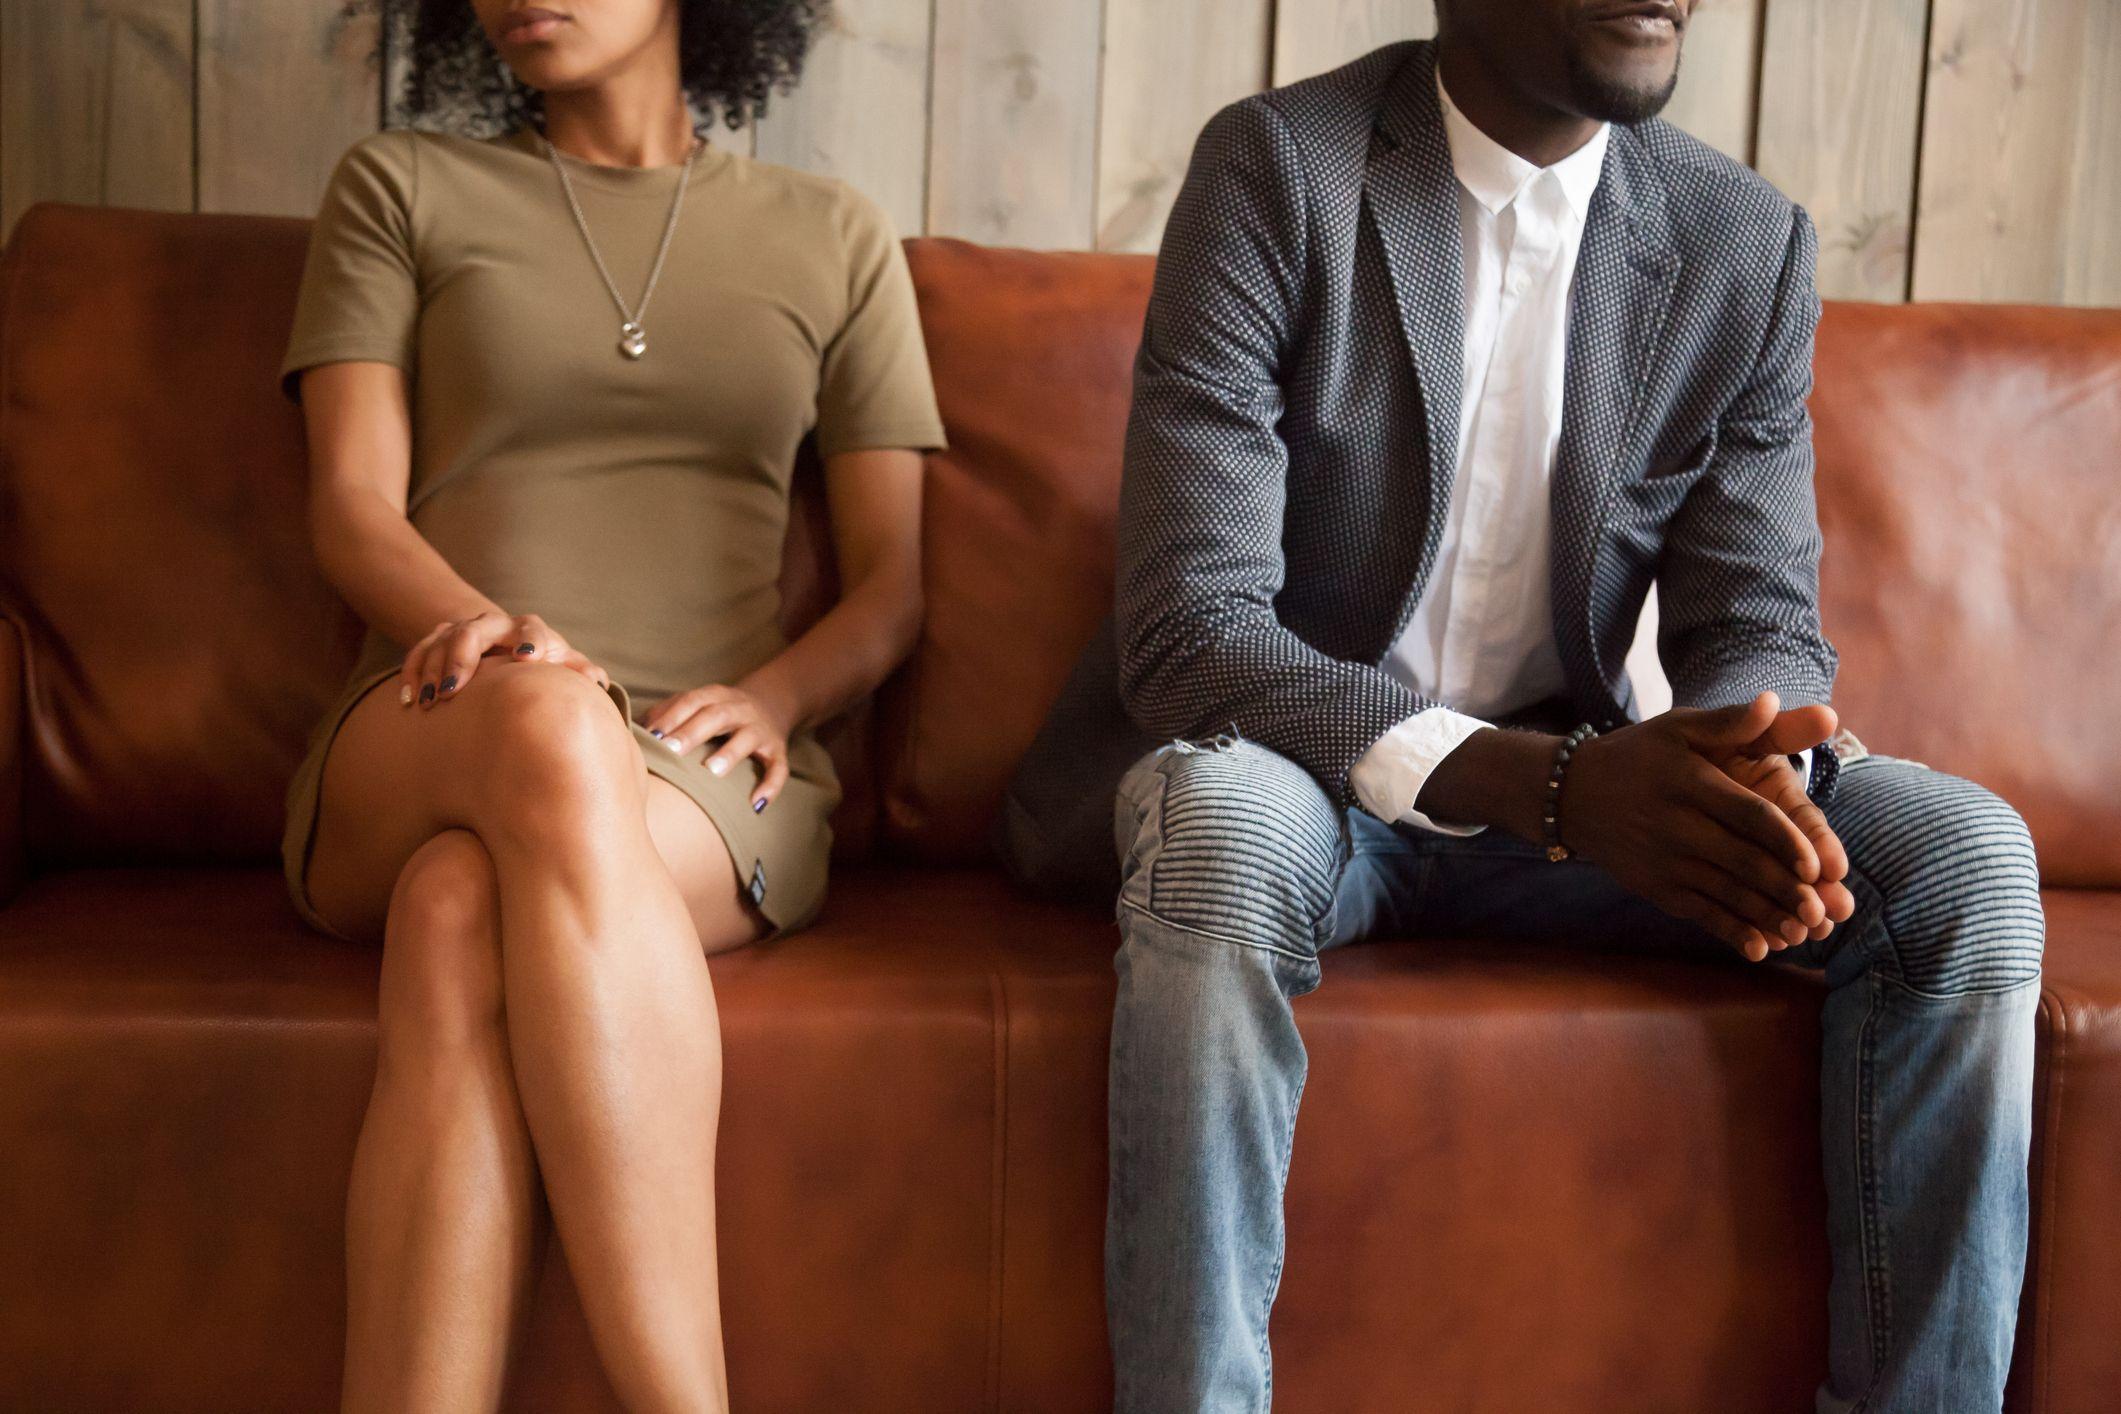 couple-married-sad-stock